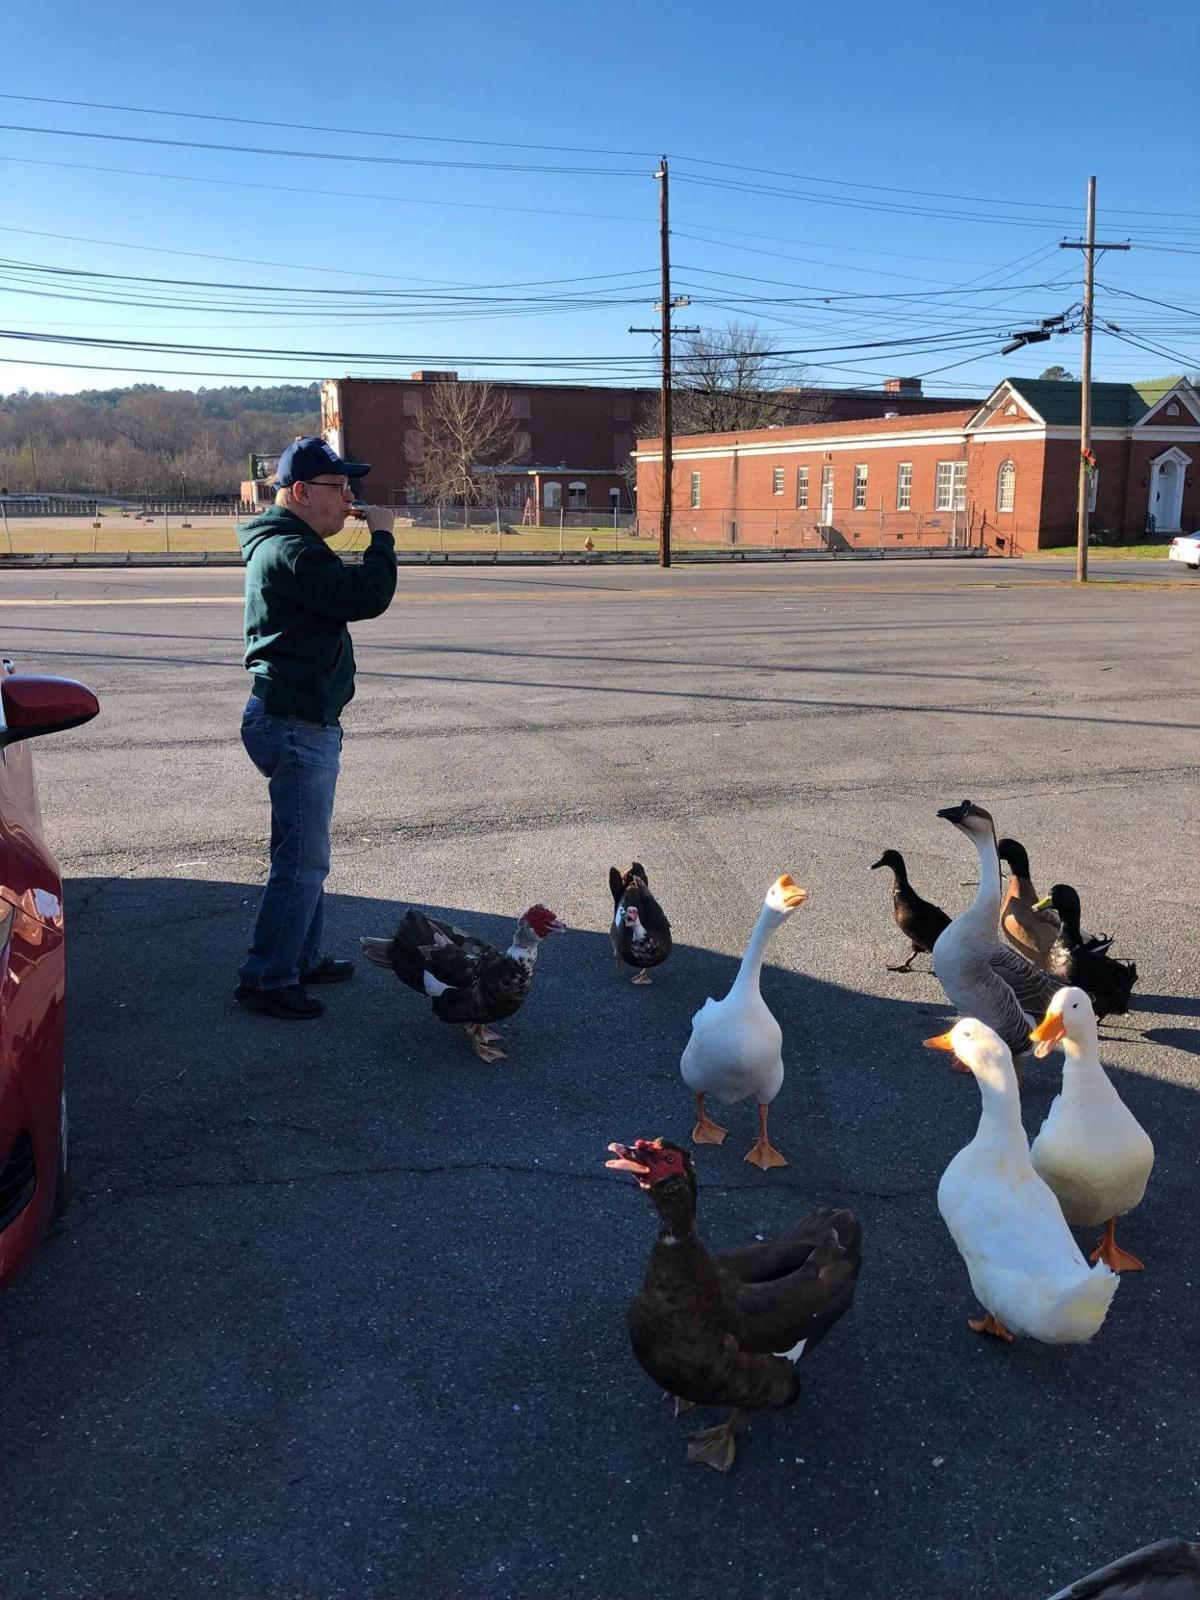 Rome couple feeds, names 24 Lindale ducks